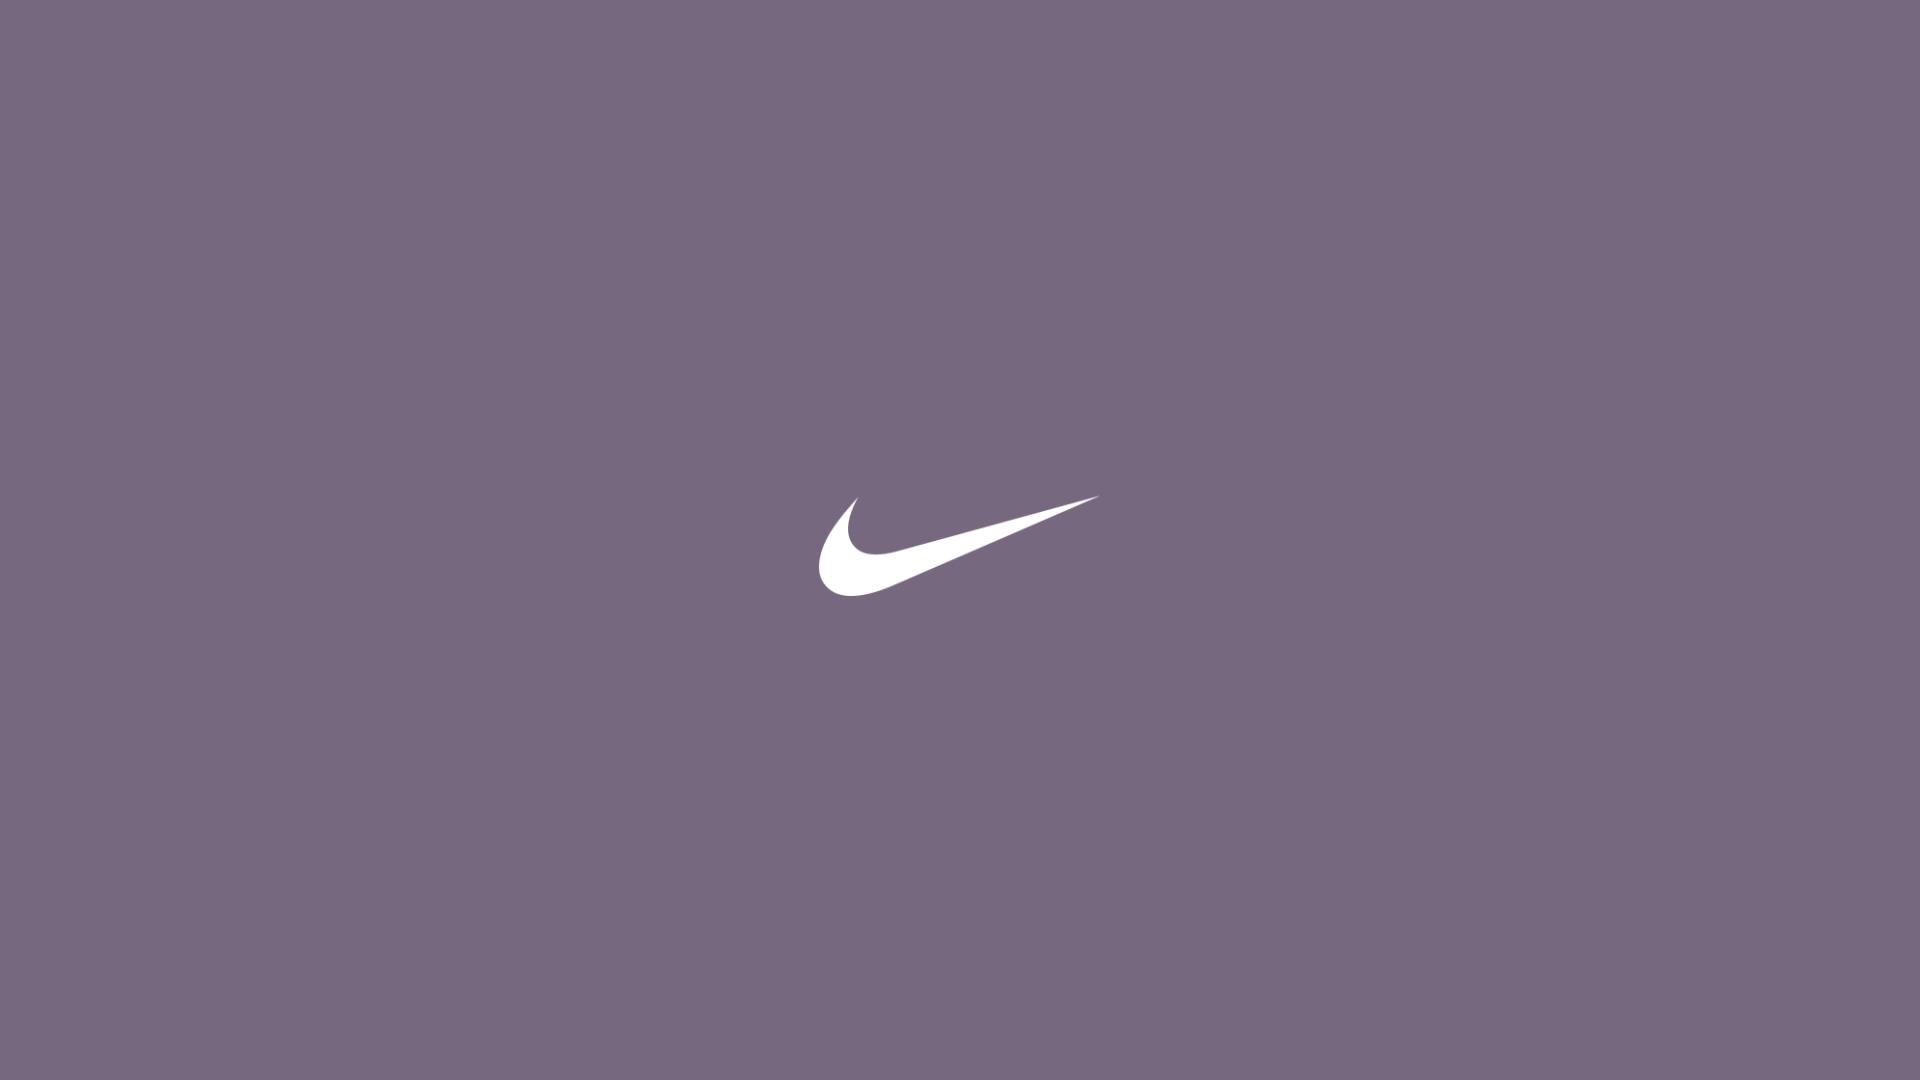 Nike_OOH